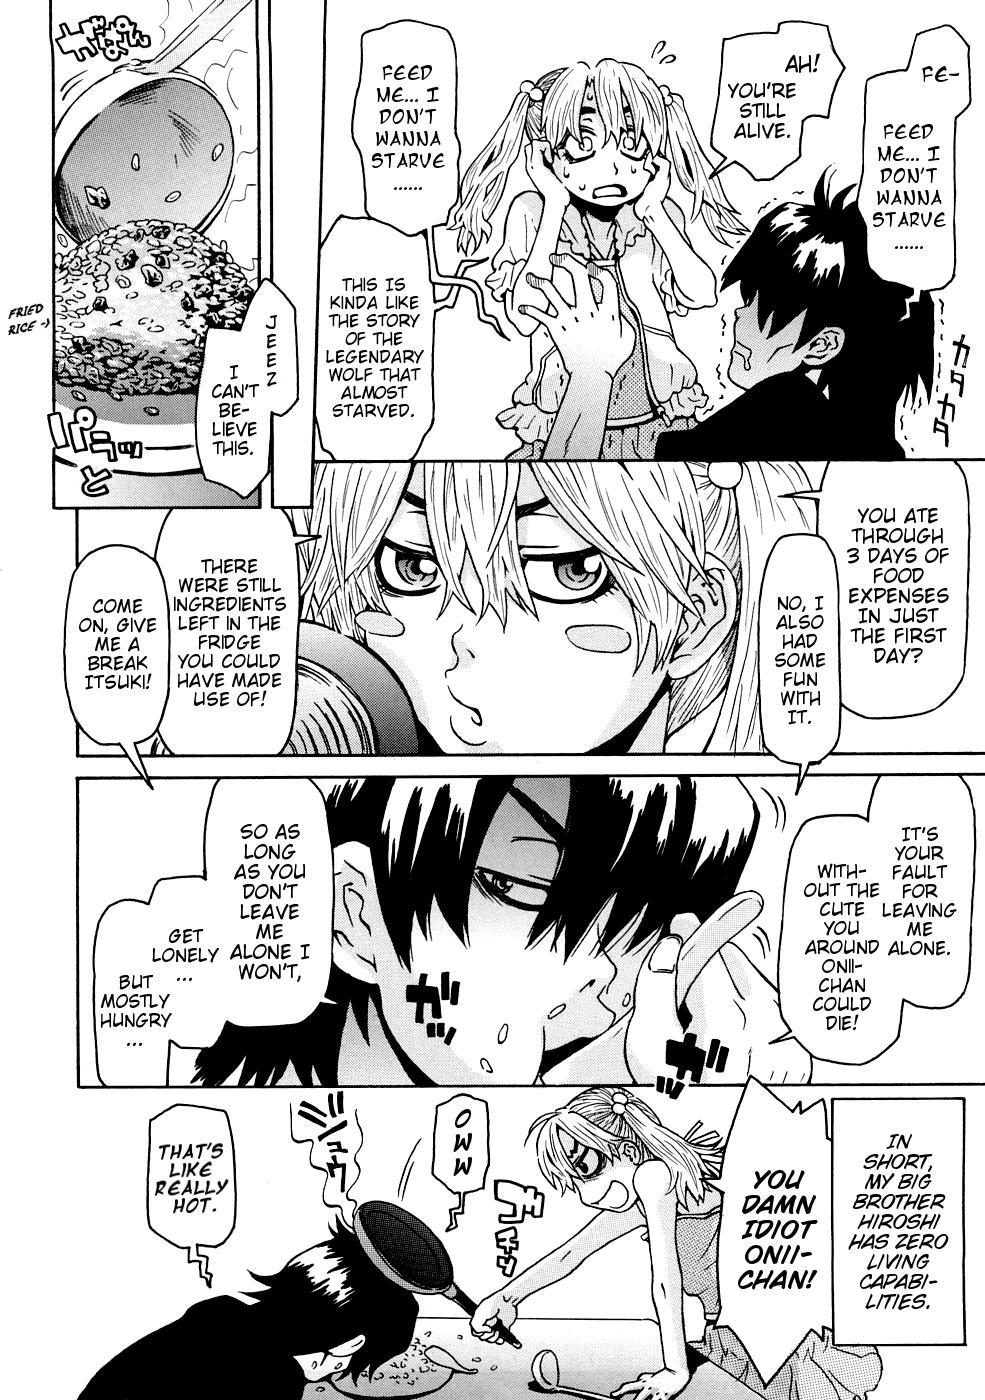 [Kobayashi Oukei] Onii-chan no Baka | Onii-chan You Idiot [English] {Mistvern} 1